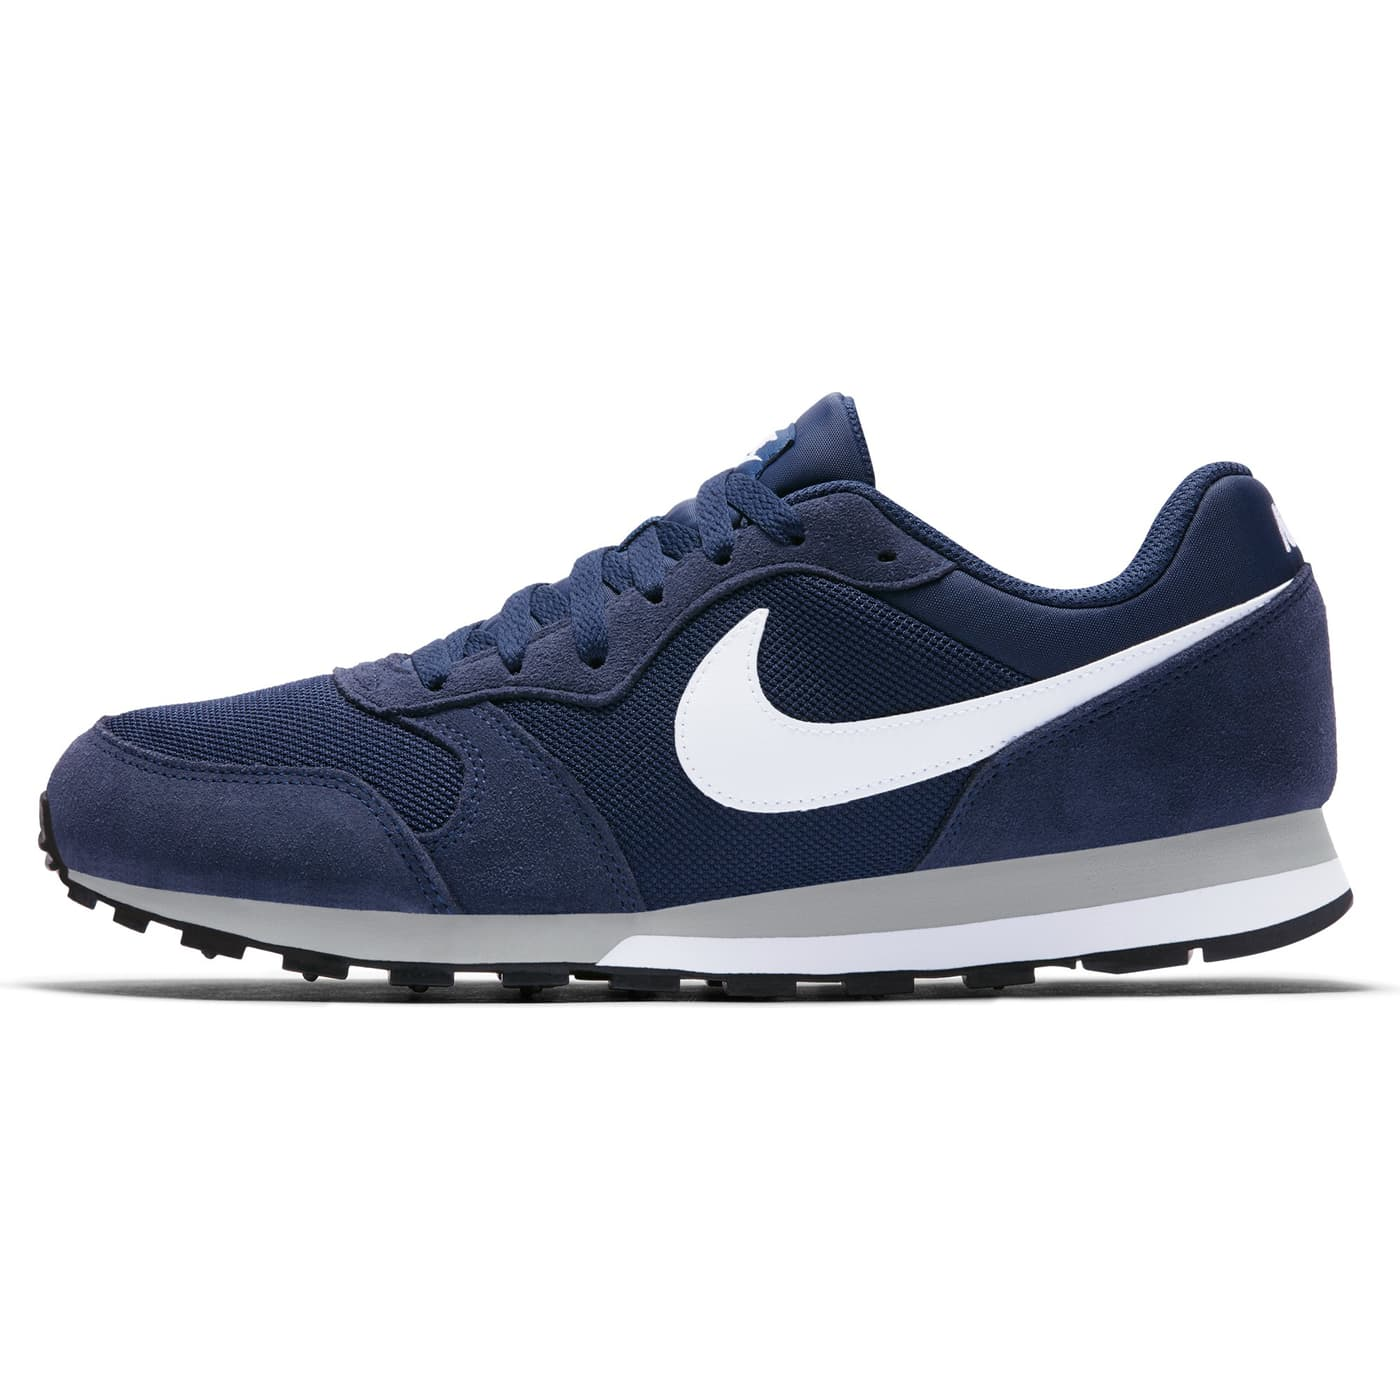 86e9edafa5483 Nike MD Runner 2 Chaussures de loisirs pour homme   Migros